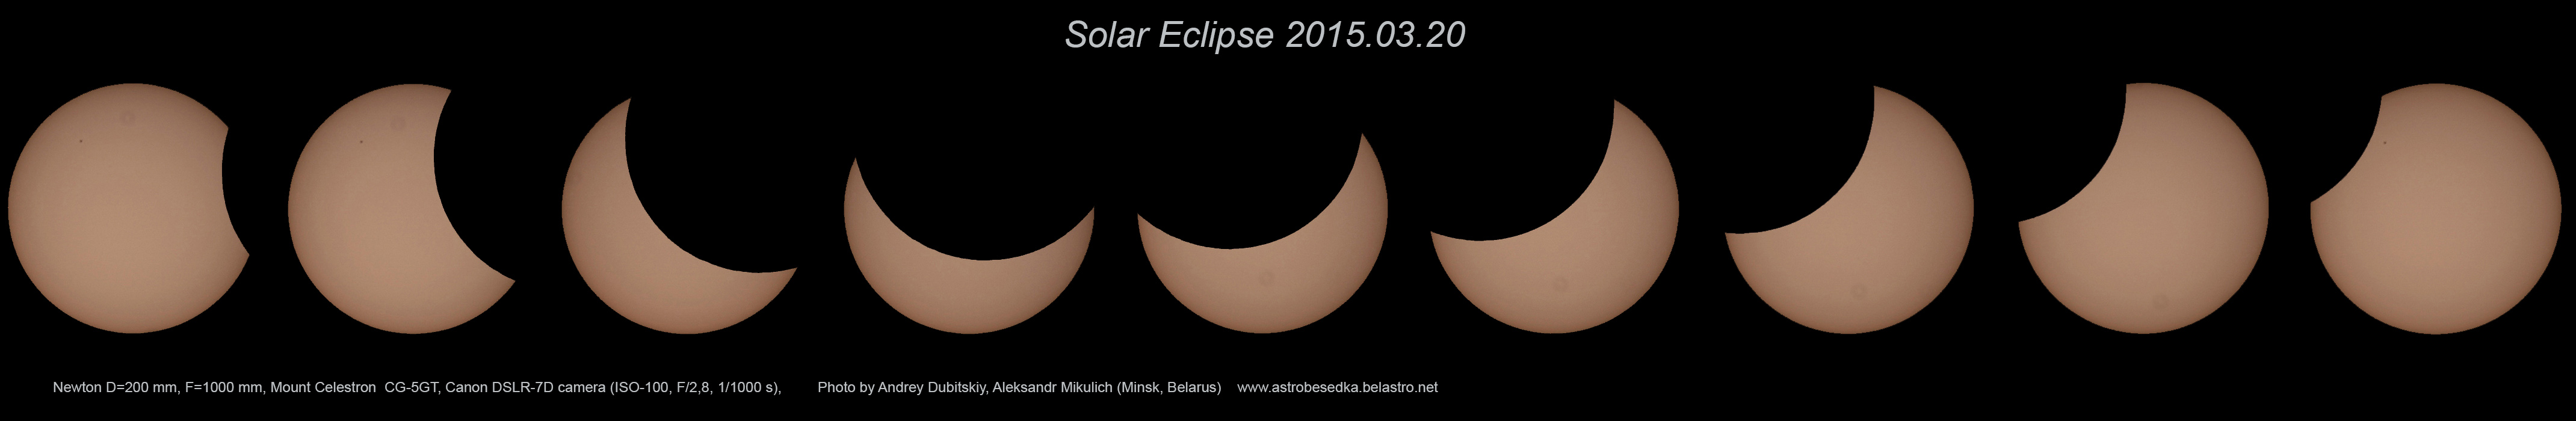 !SolarEclipse_2015